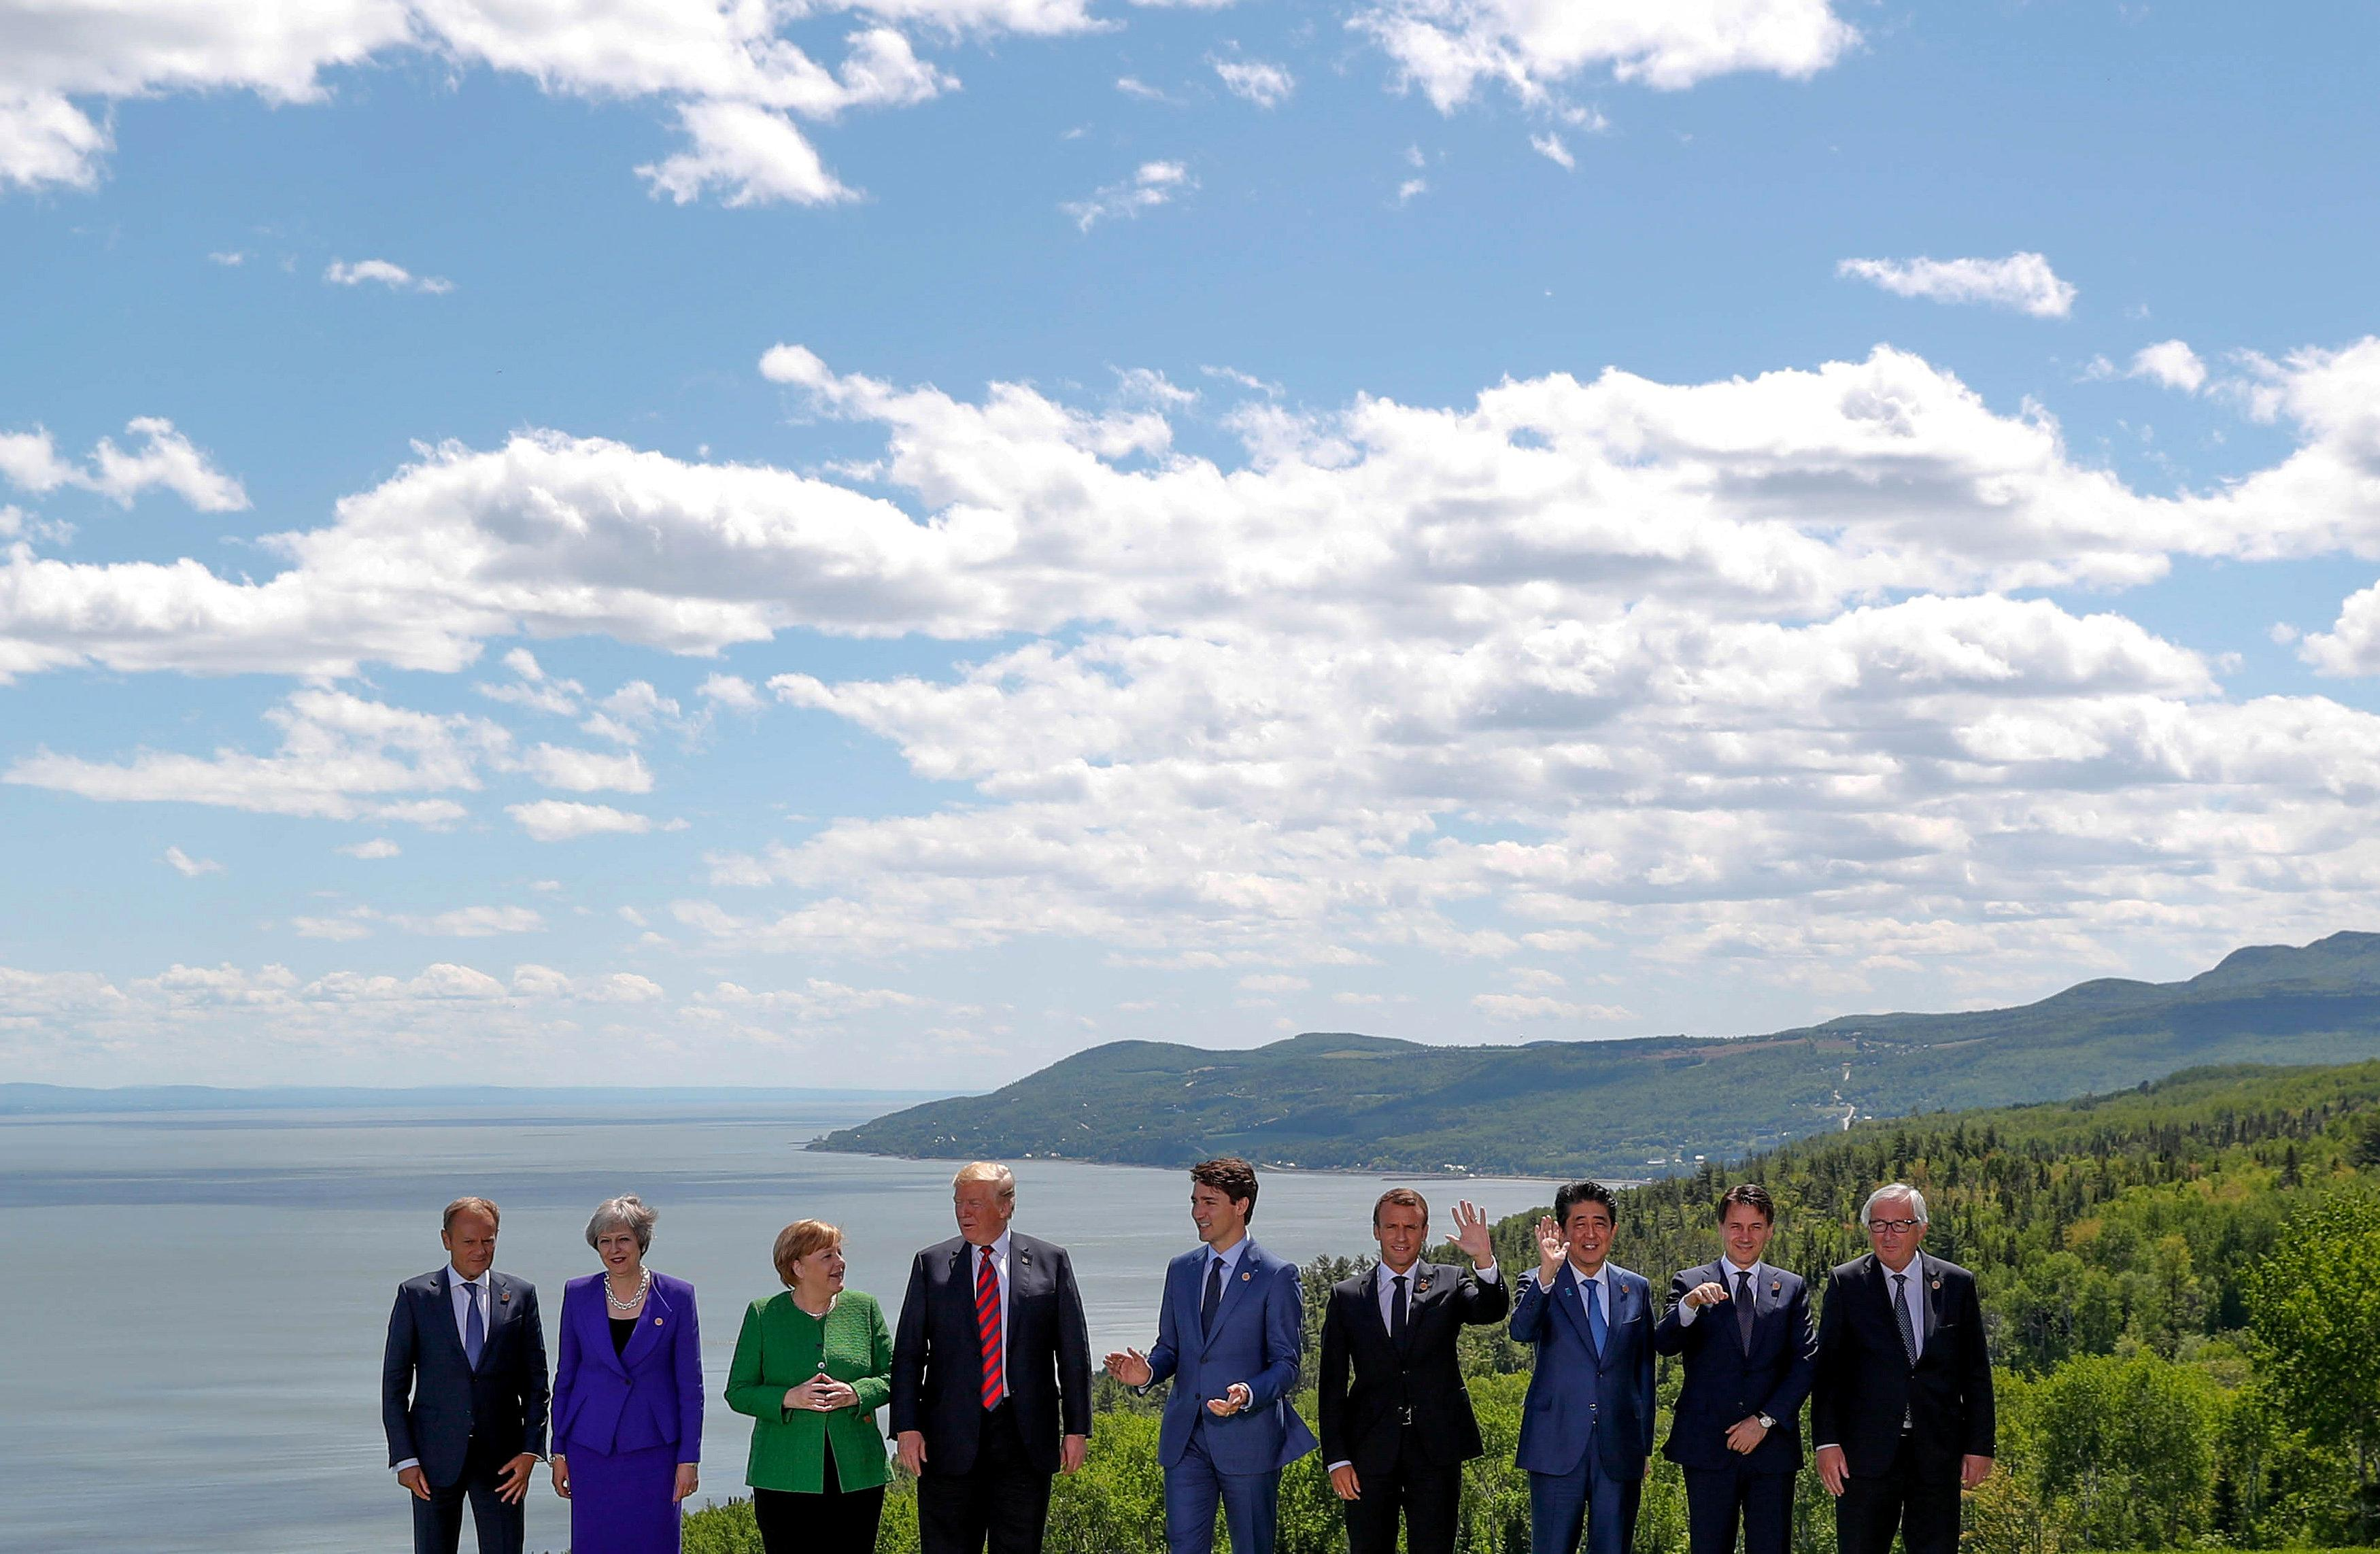 8676efda4849b The Charlevoix G7 Summit Communique